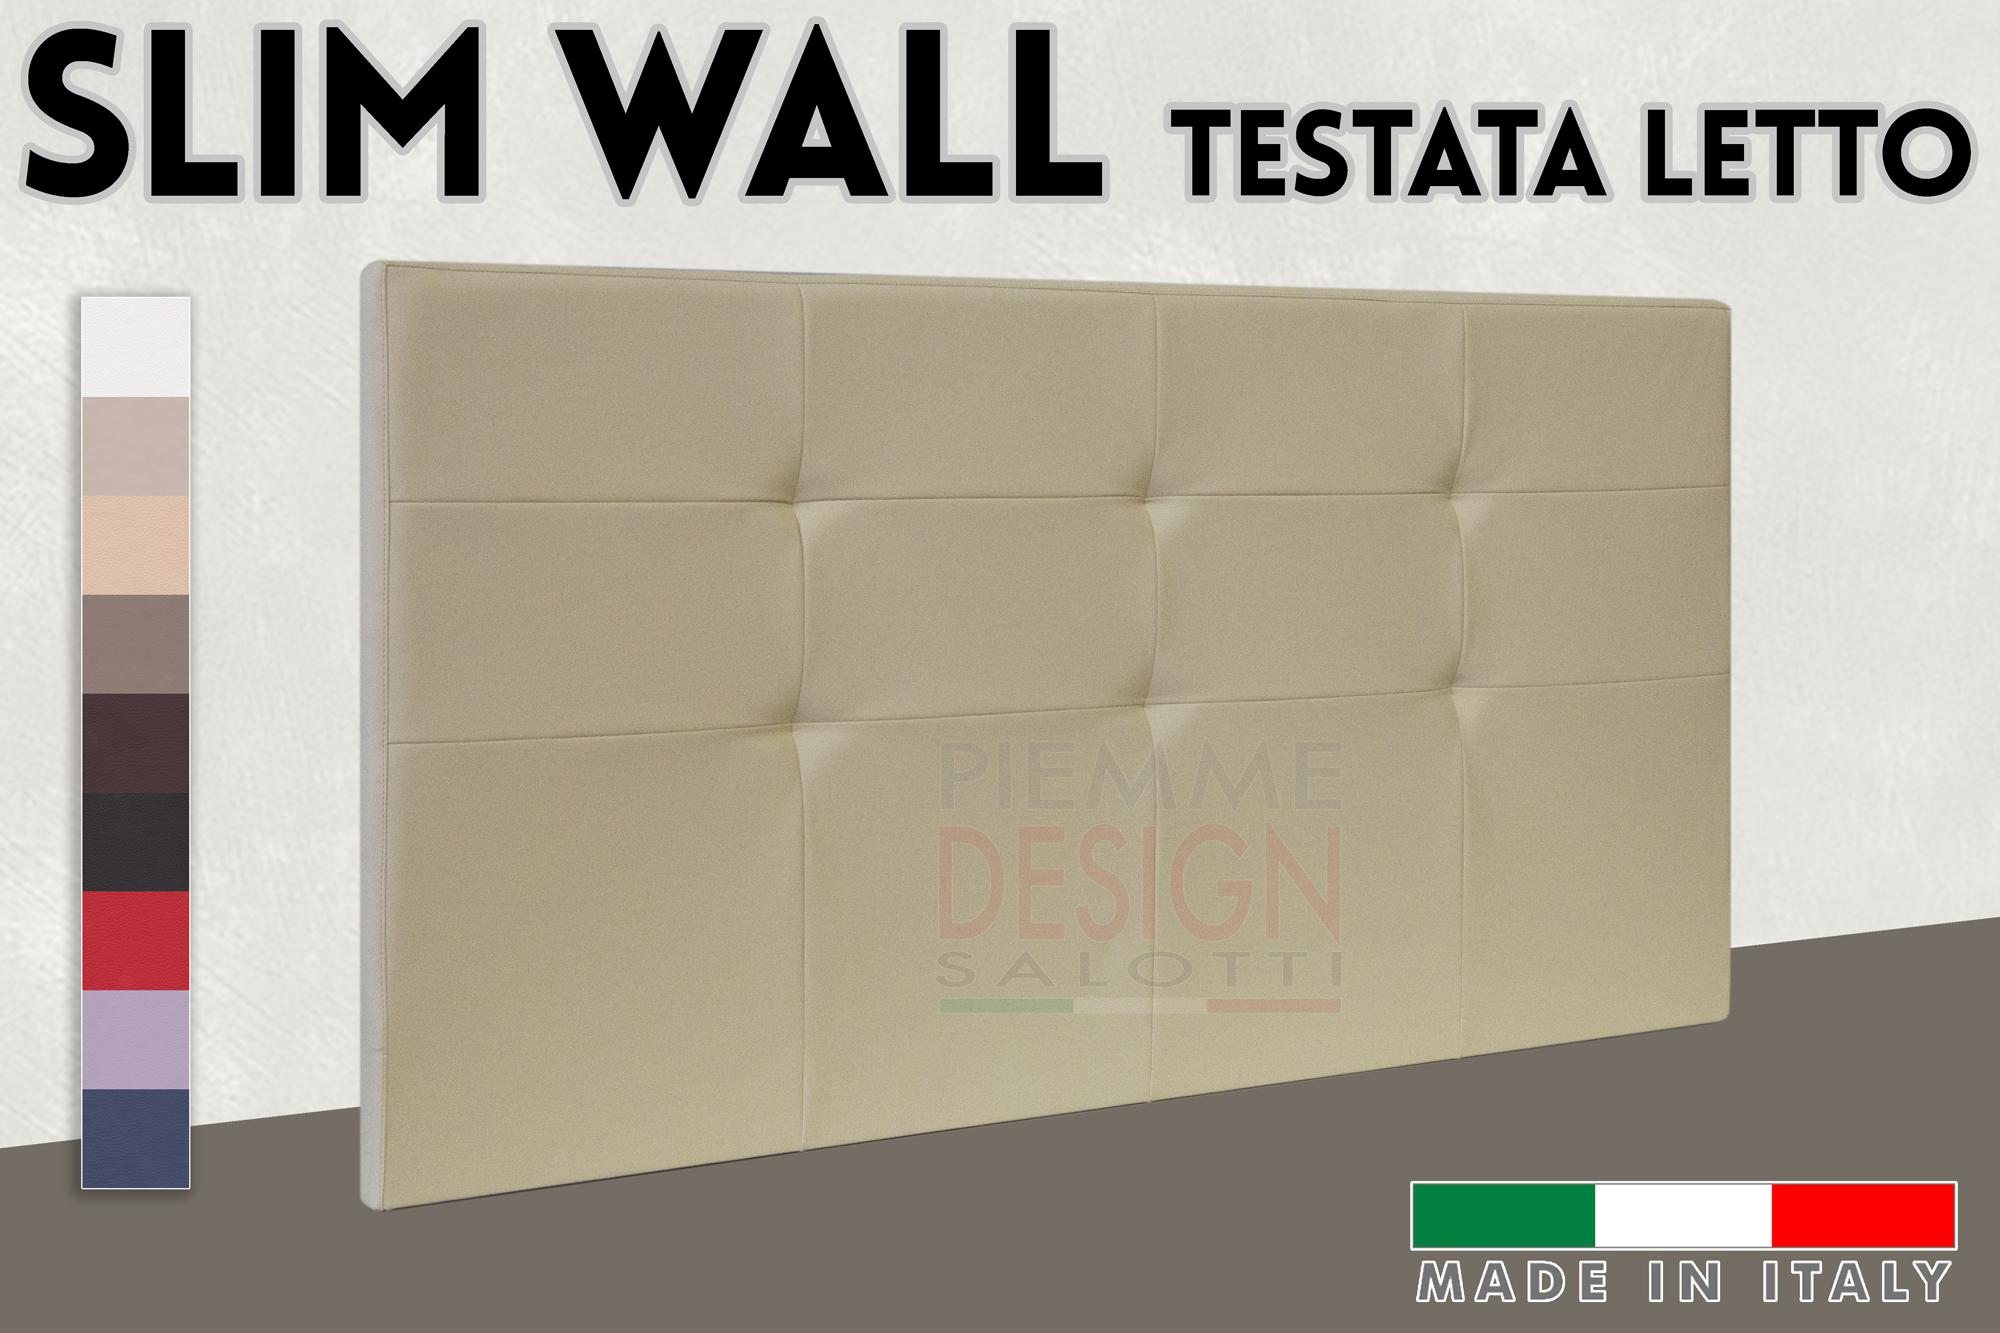 slim_wall_sito_text.png